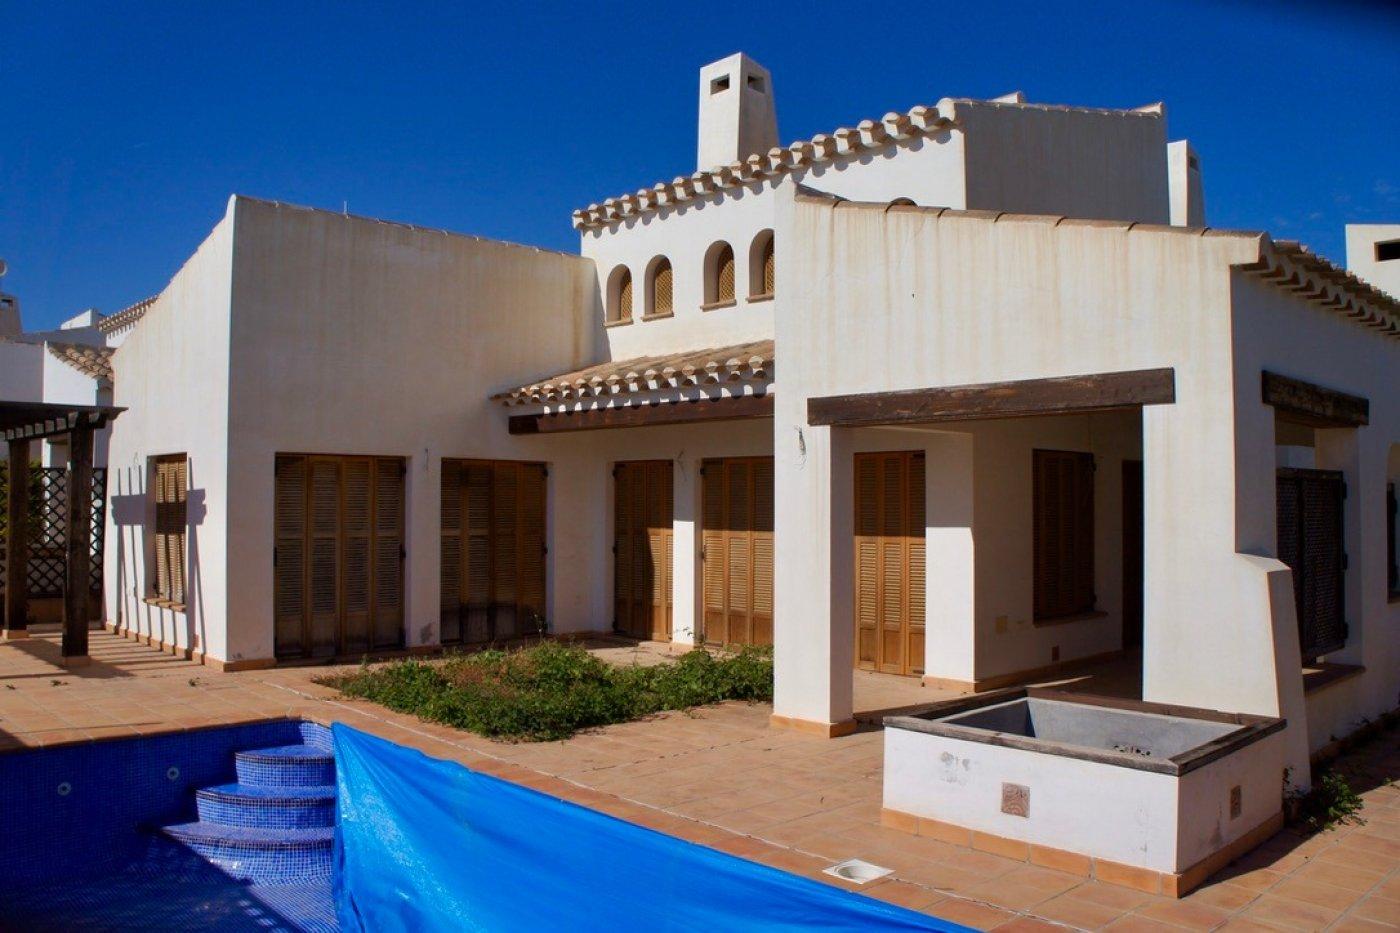 Gallery Image 1 of Fantastic offer - bank repossessed south facing villa on EL Valle Golf Resort